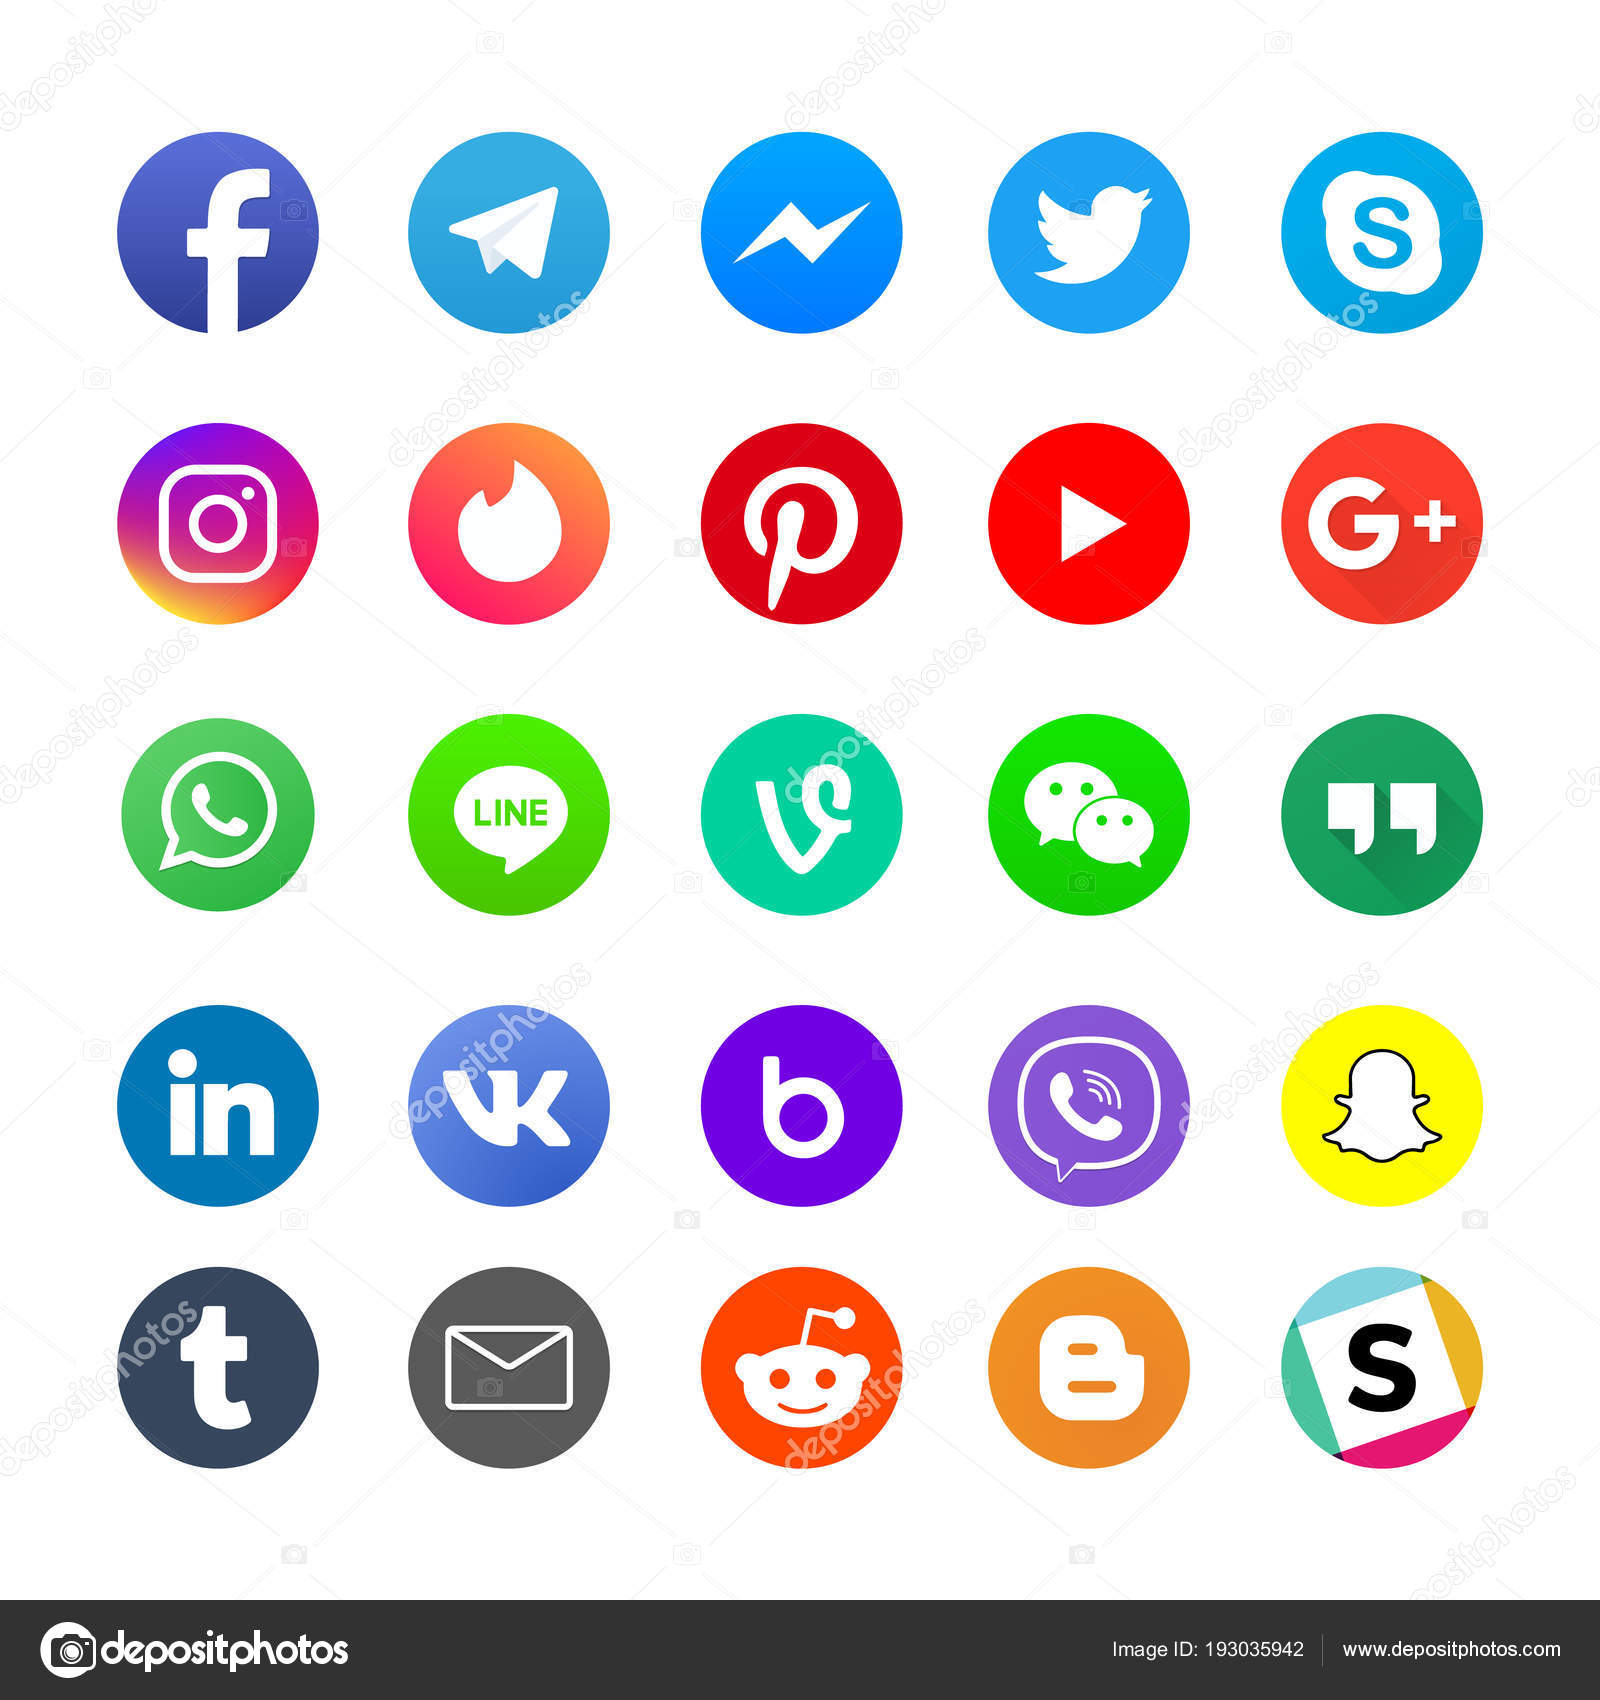 44713ed5615 Δημοφιλή μέσα κοινωνικής δικτύωσης app και messenger εικόνες set ...